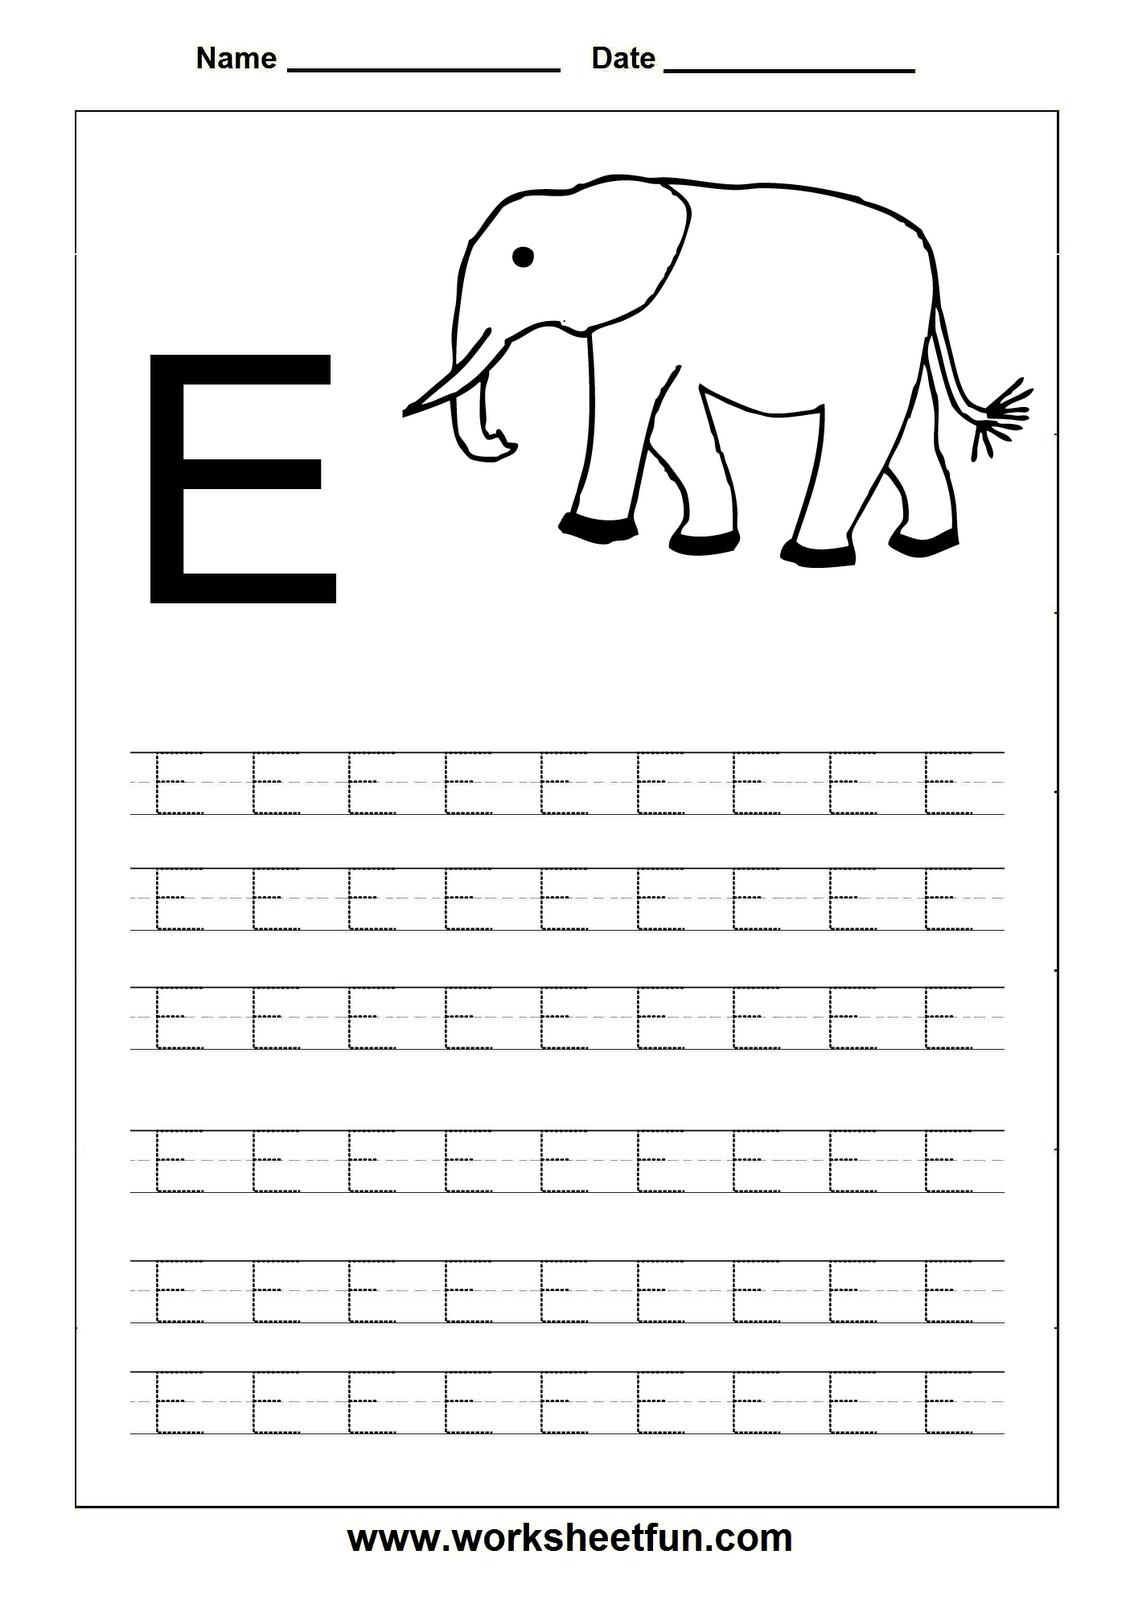 Free Printable Worksheets - Contents | Letter E Worksheets